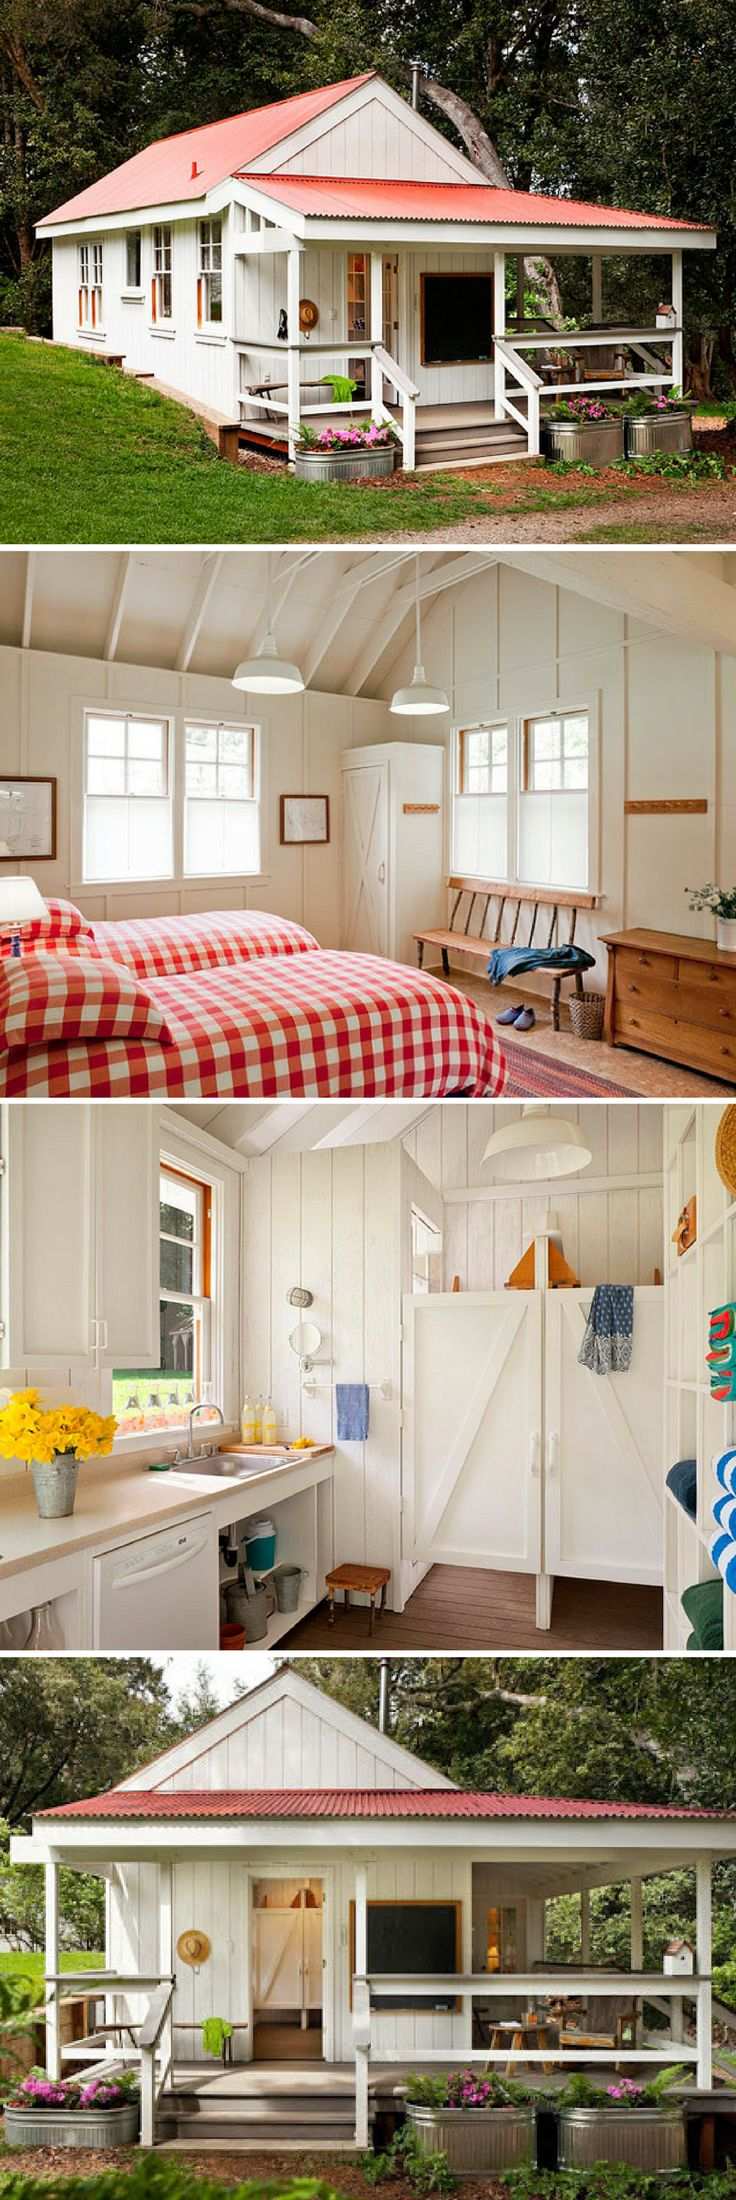 A cheerful California tiny house